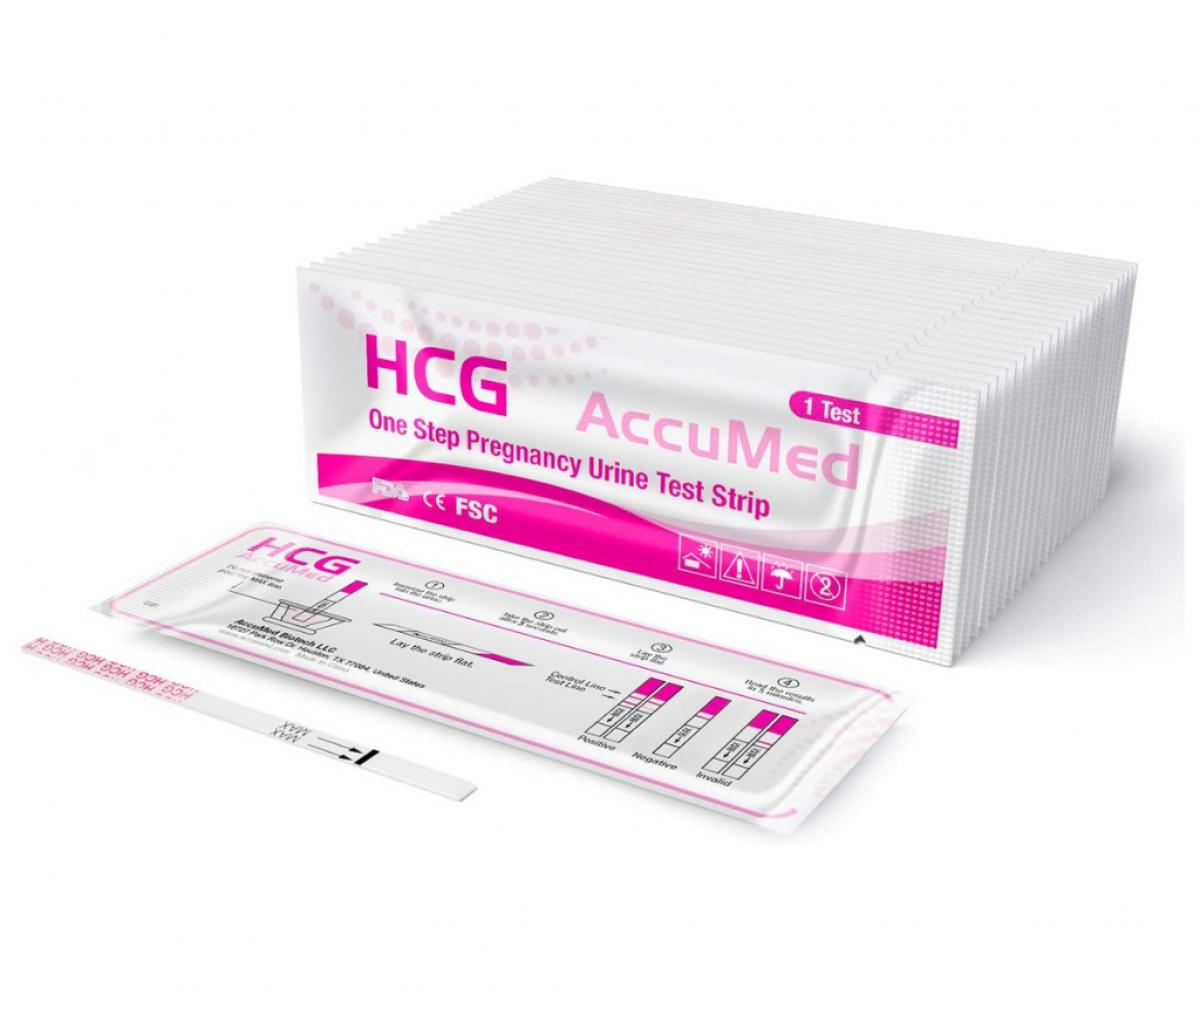 HCG Serum Test Strips